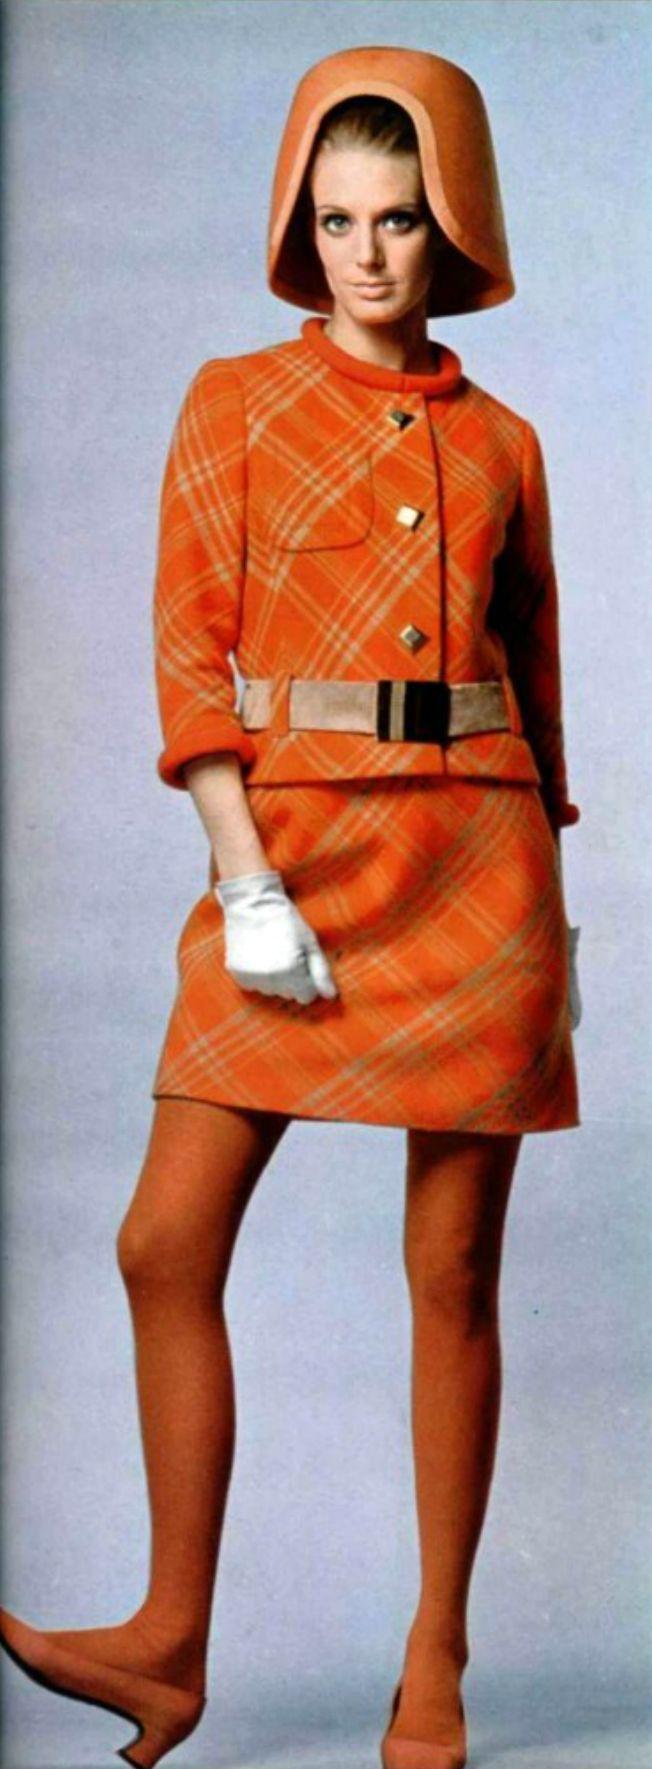 History of Fashion 1960's - 1970's - Catwalk Yourself 1970 s fashion magazines